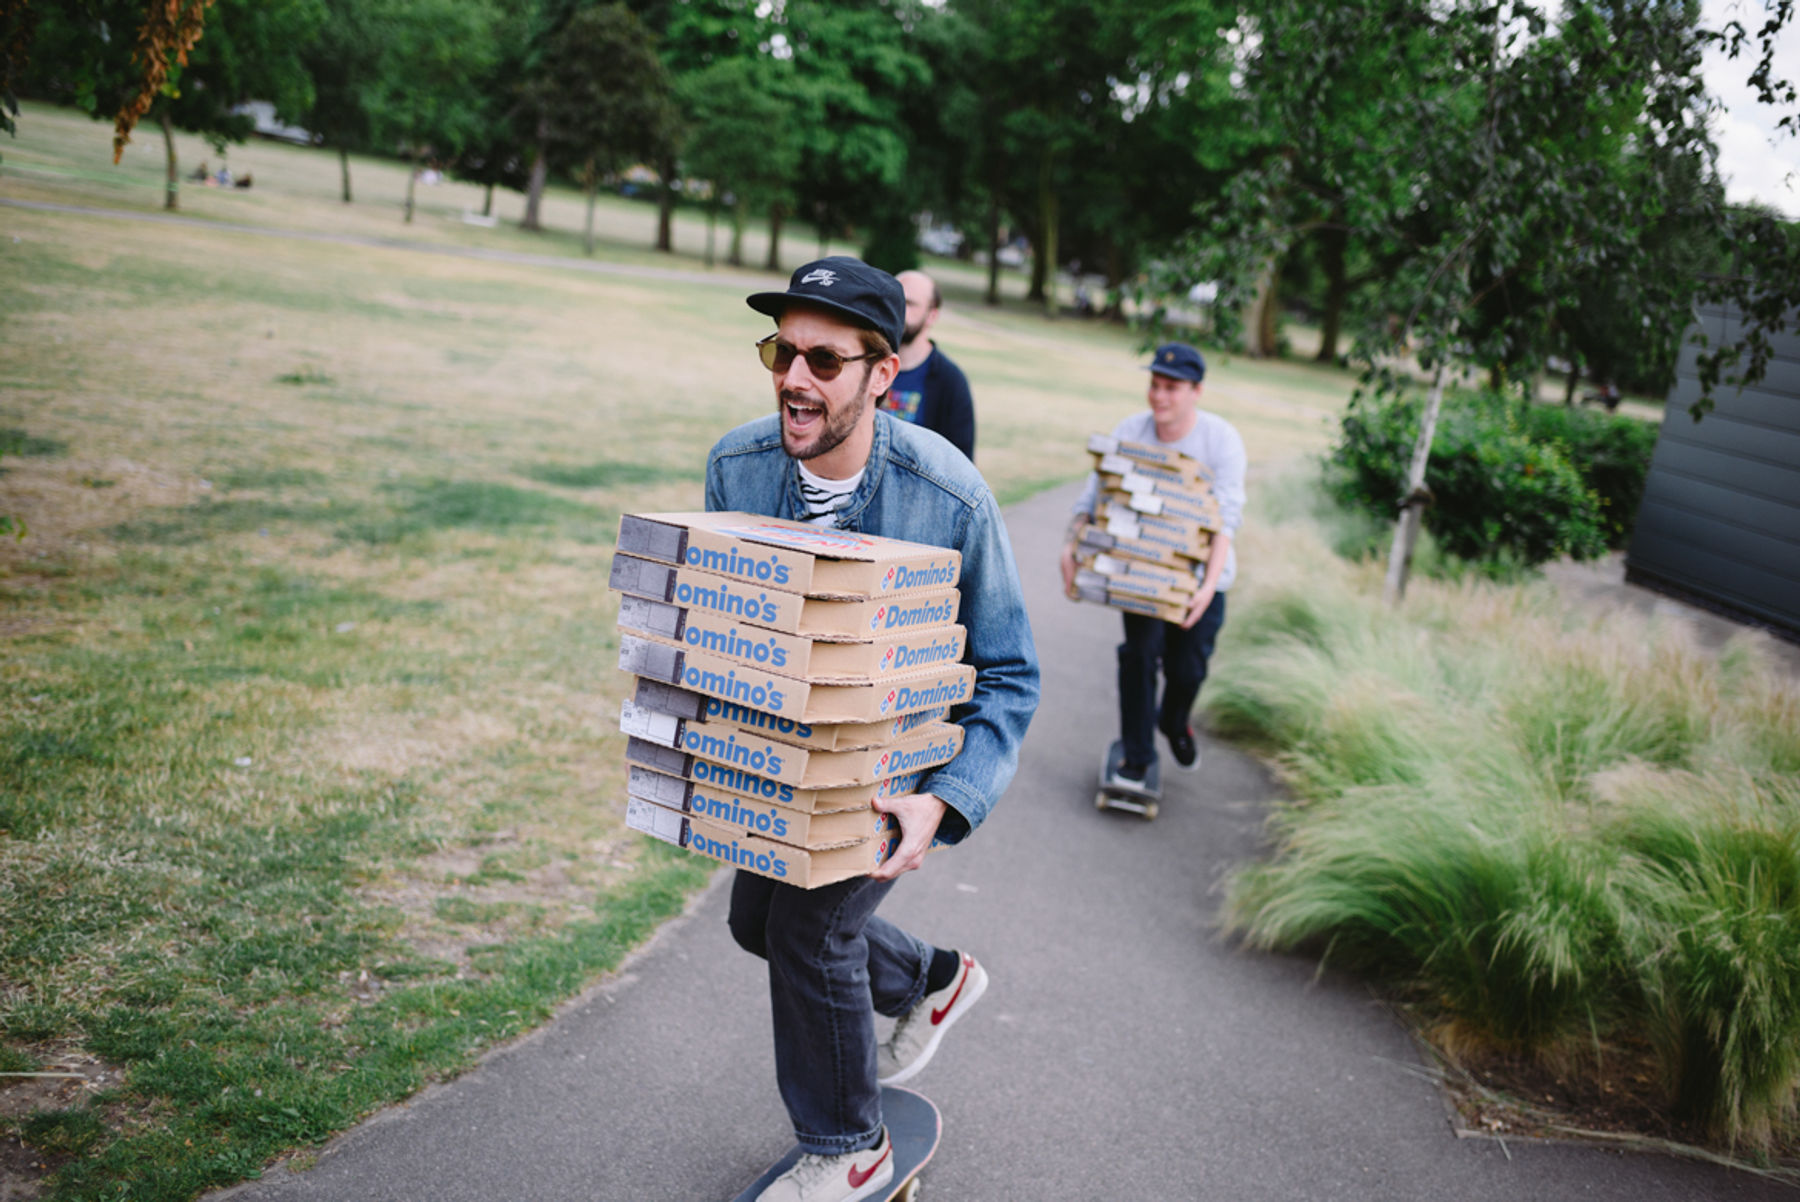 _IHC8179e-Julien-Lacor-Matthew-Hay-Nike-SB-x-Slam-City-Skates-Go-Skateboarding-Day-London-June-2015-Photographer-Maksim-Kalanep